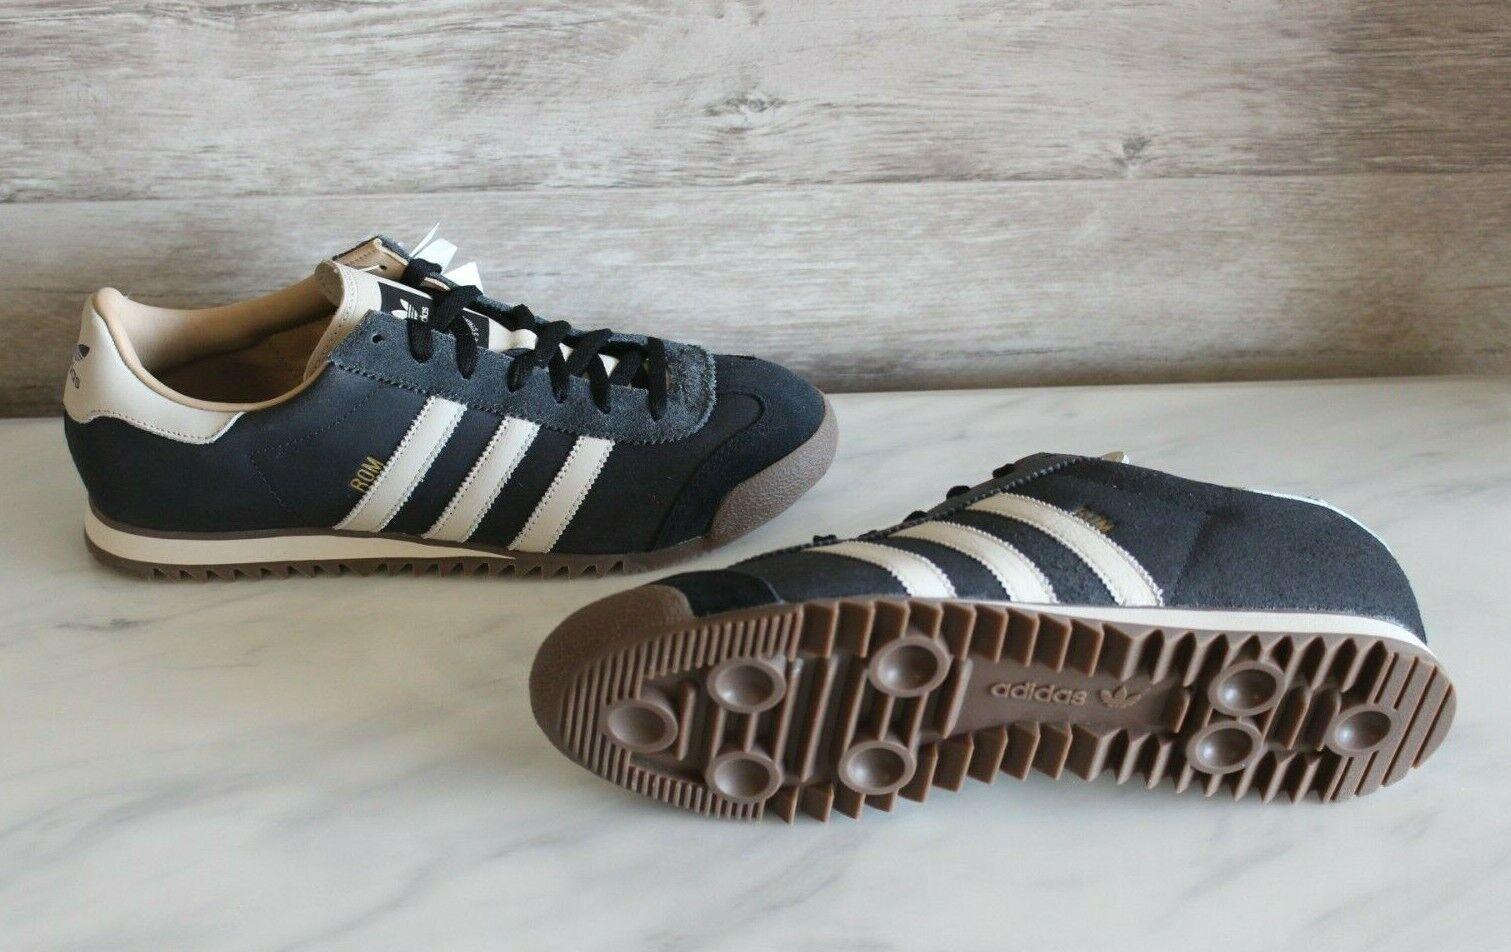 Brilliant Navy while  Adidas Originals City Series Bern ROM Oslo Amsterdam Men Sneaker Shoe | eBay